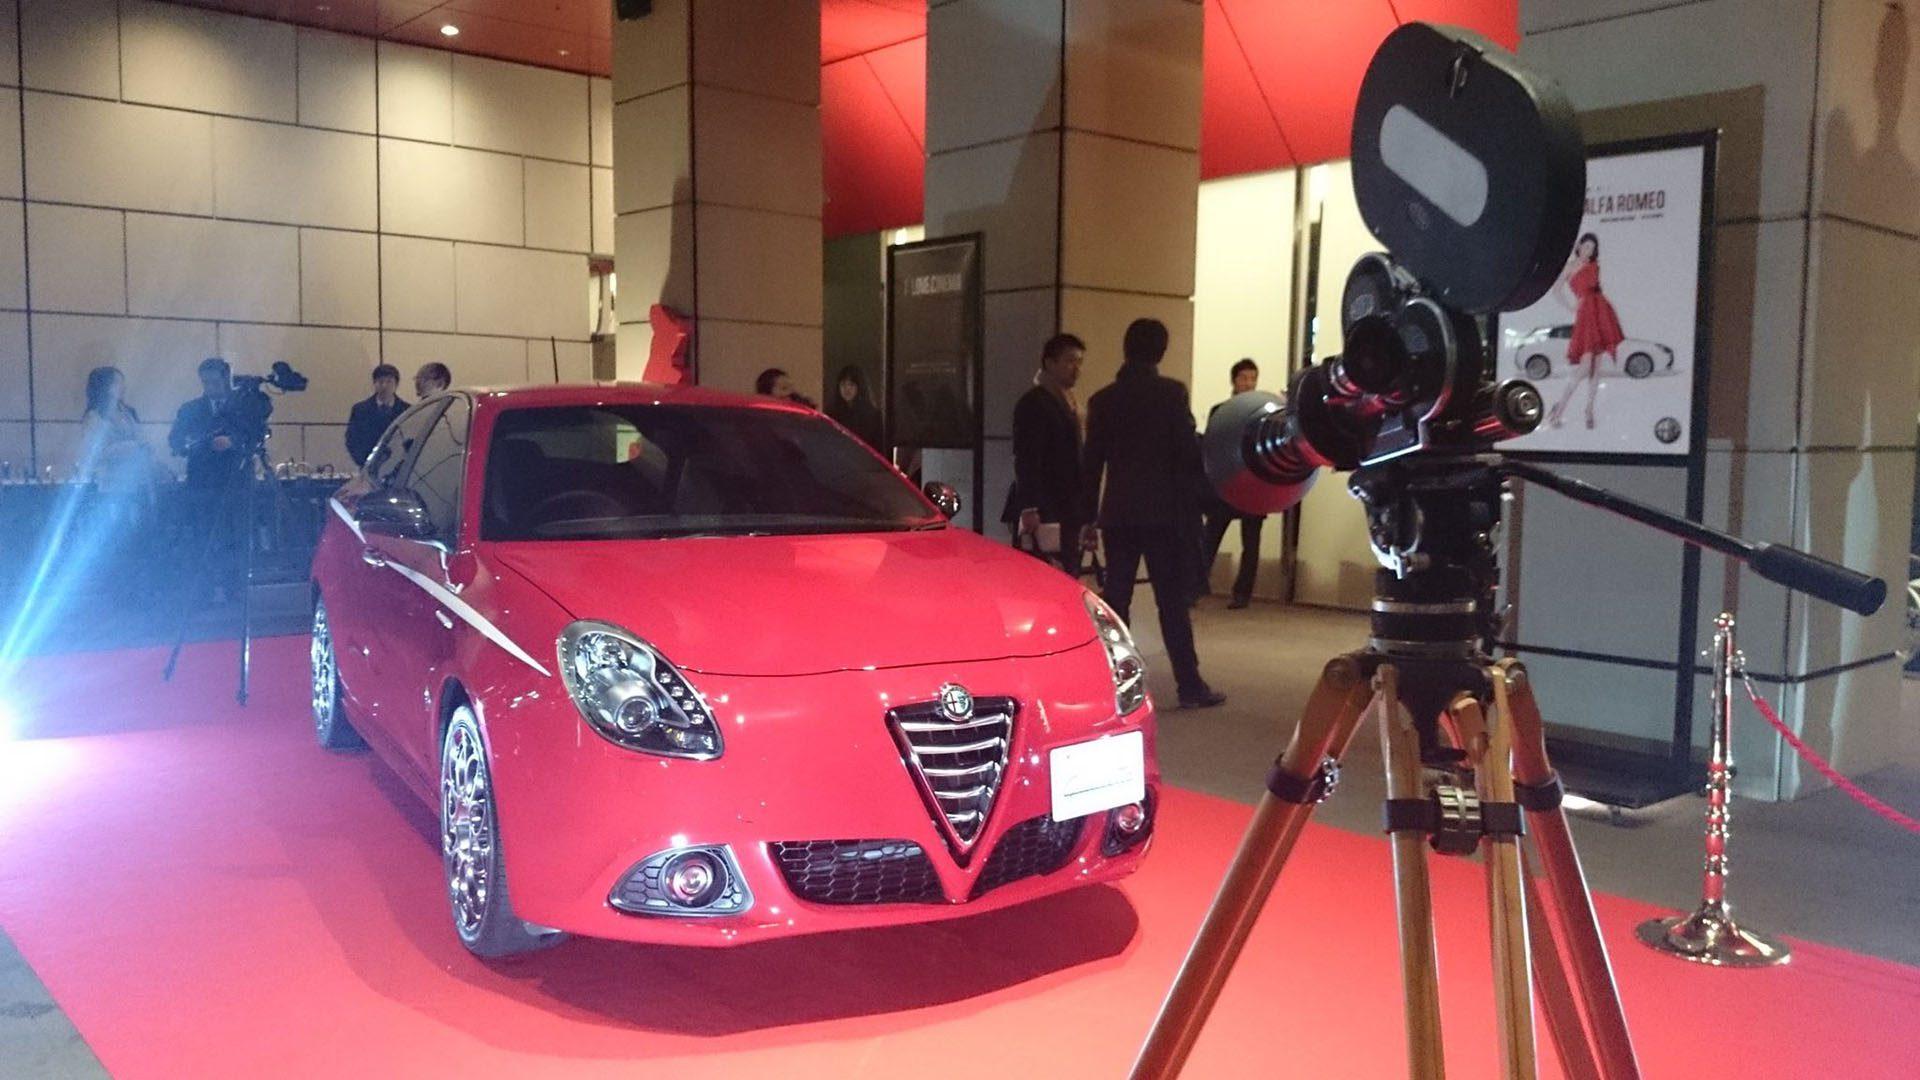 Alfa Romeo i Festiwal Filmu i Sztuki Dwa Brzegi